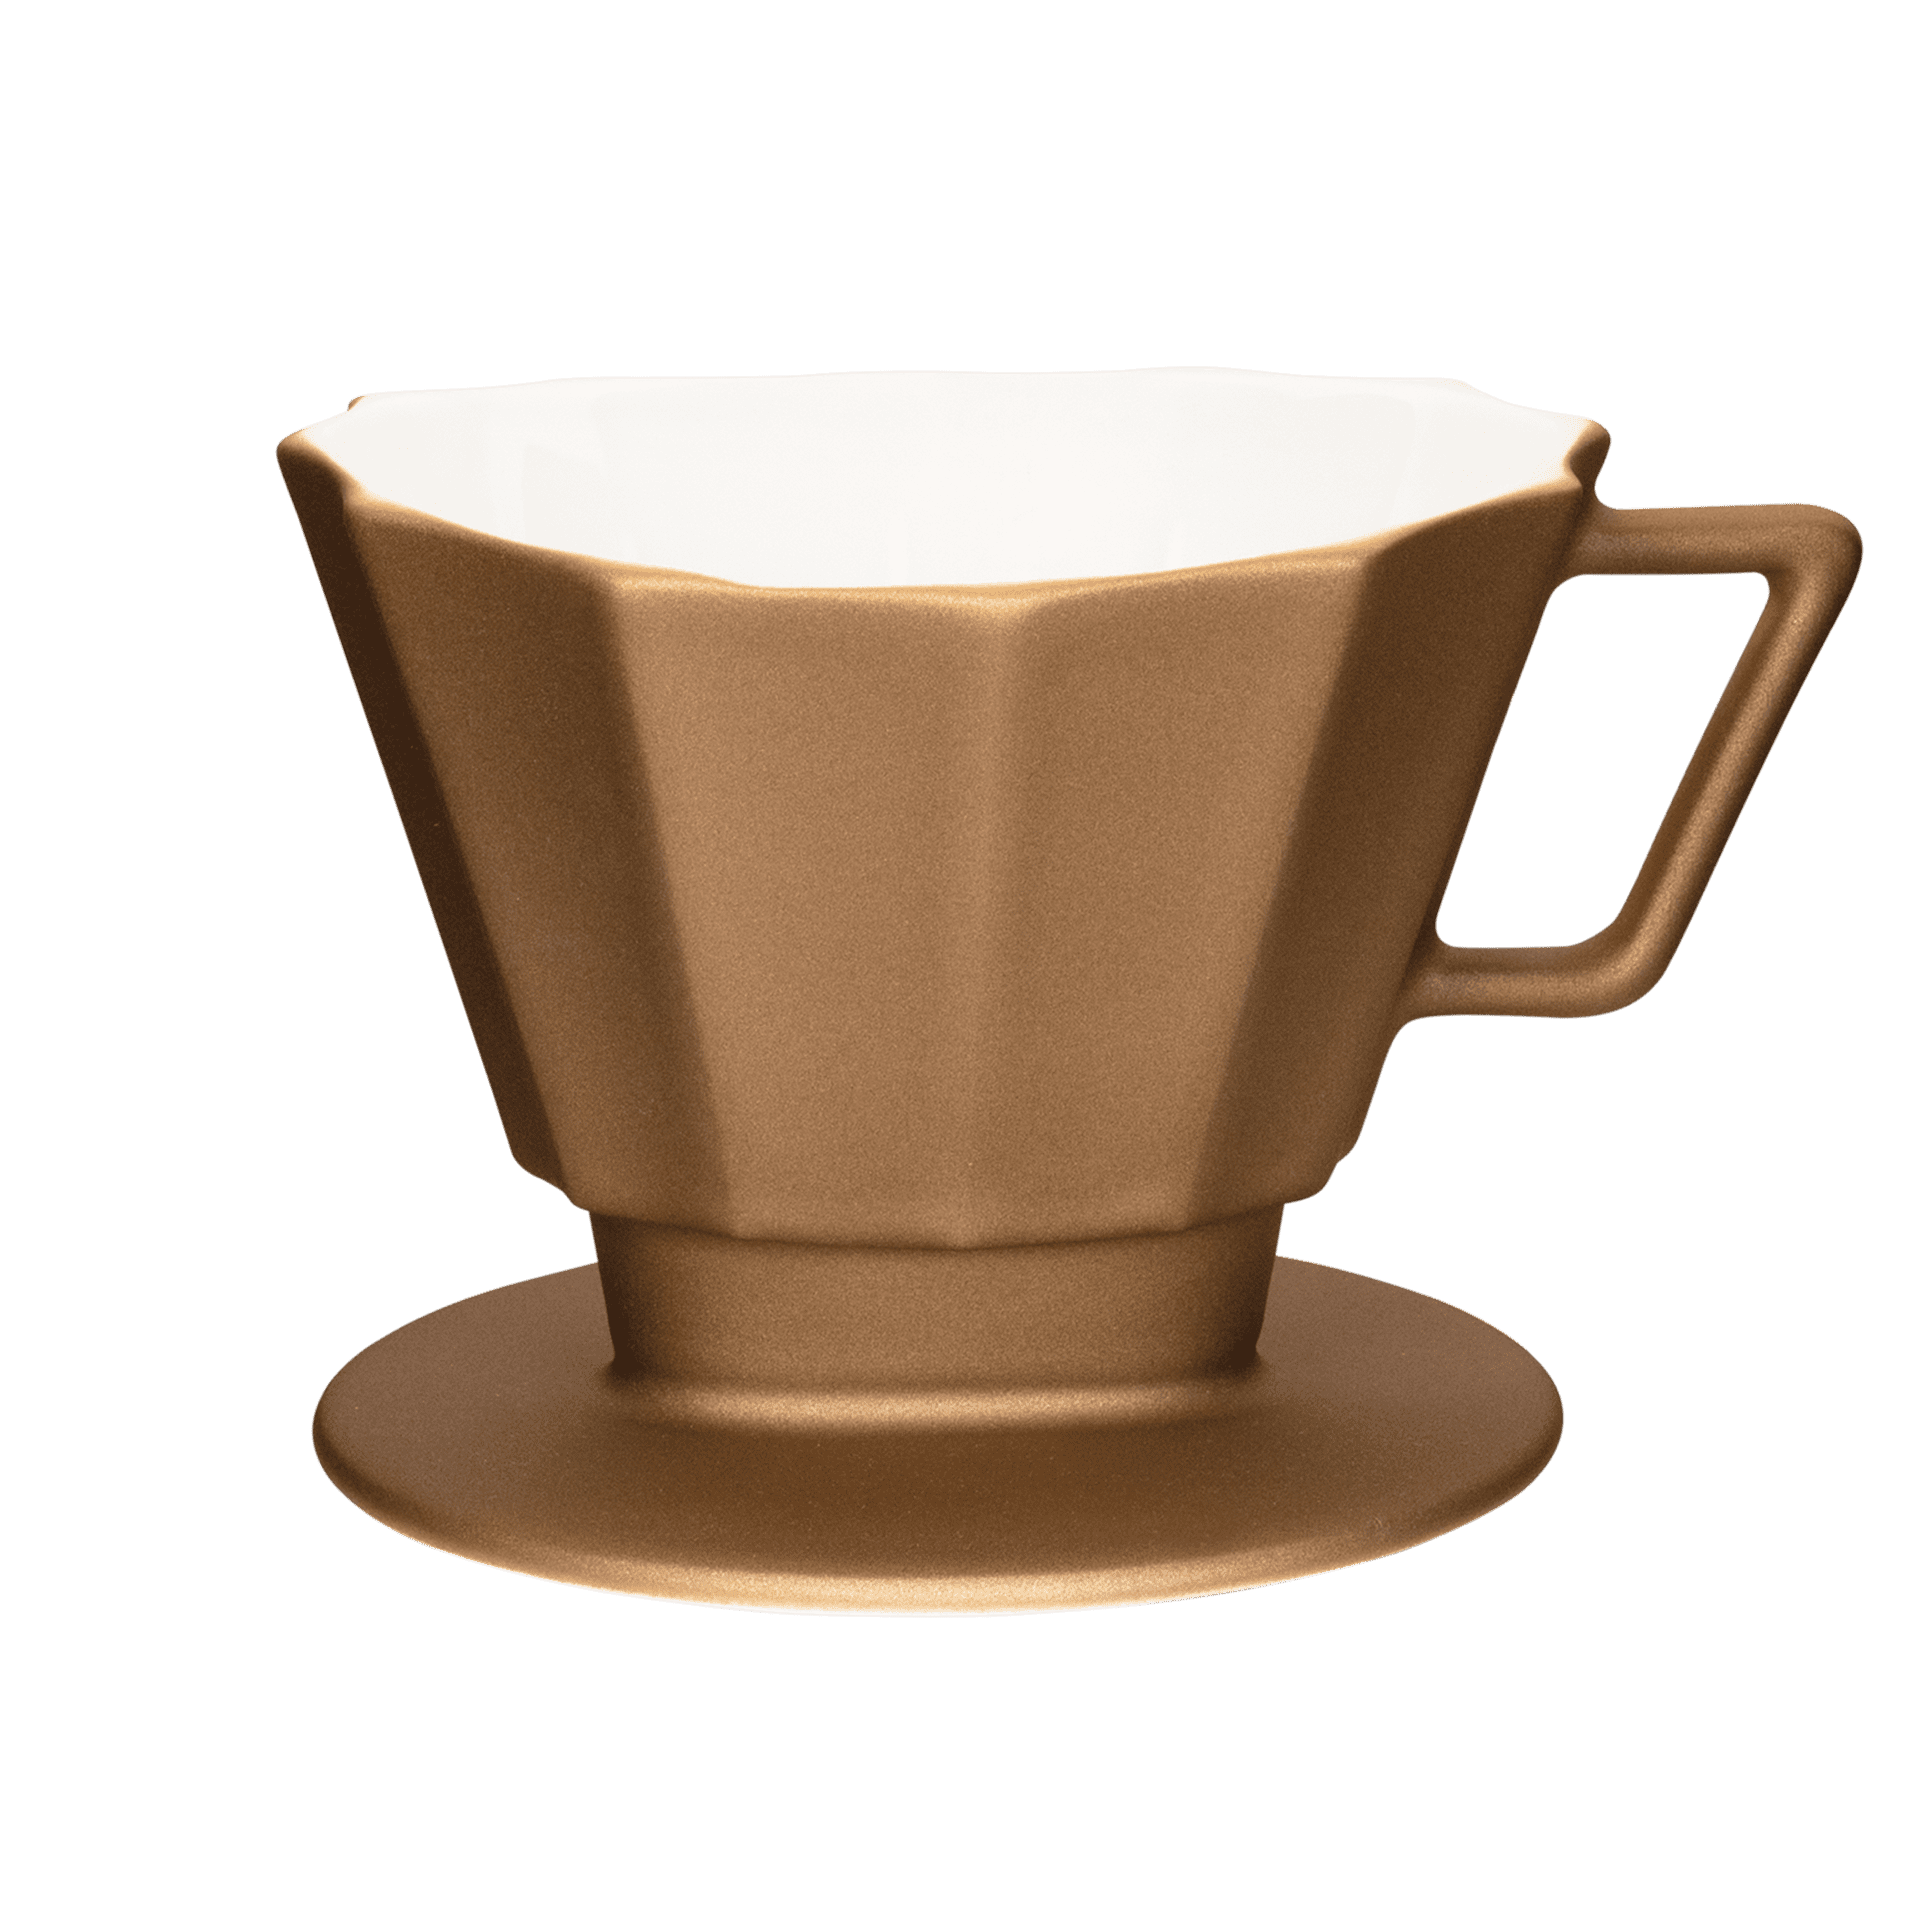 kupferfarbener kaffee-filter mit moderner form groesse 4 1x4